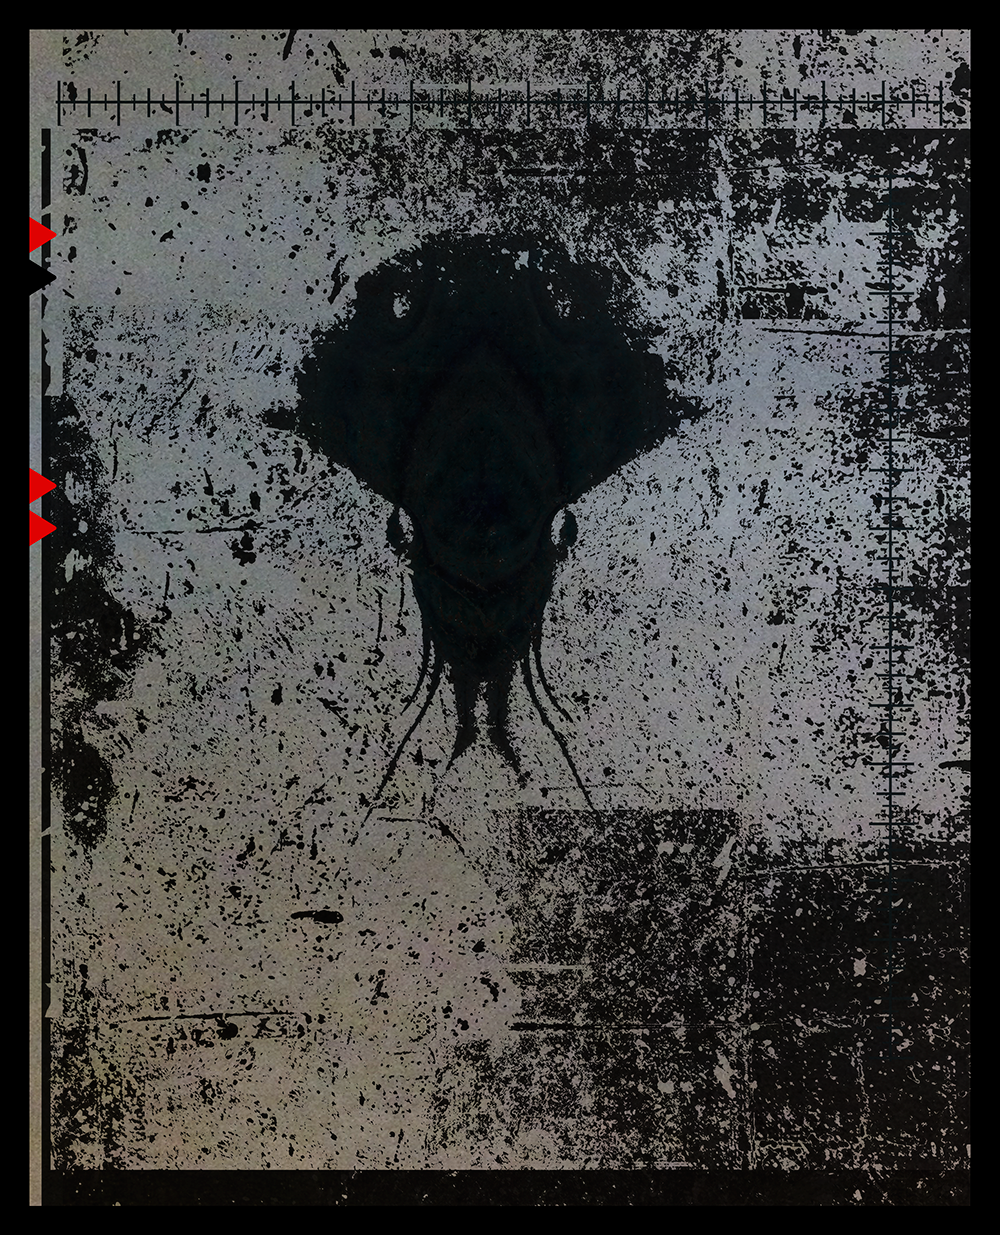 CRINI-silhouettes-11.png